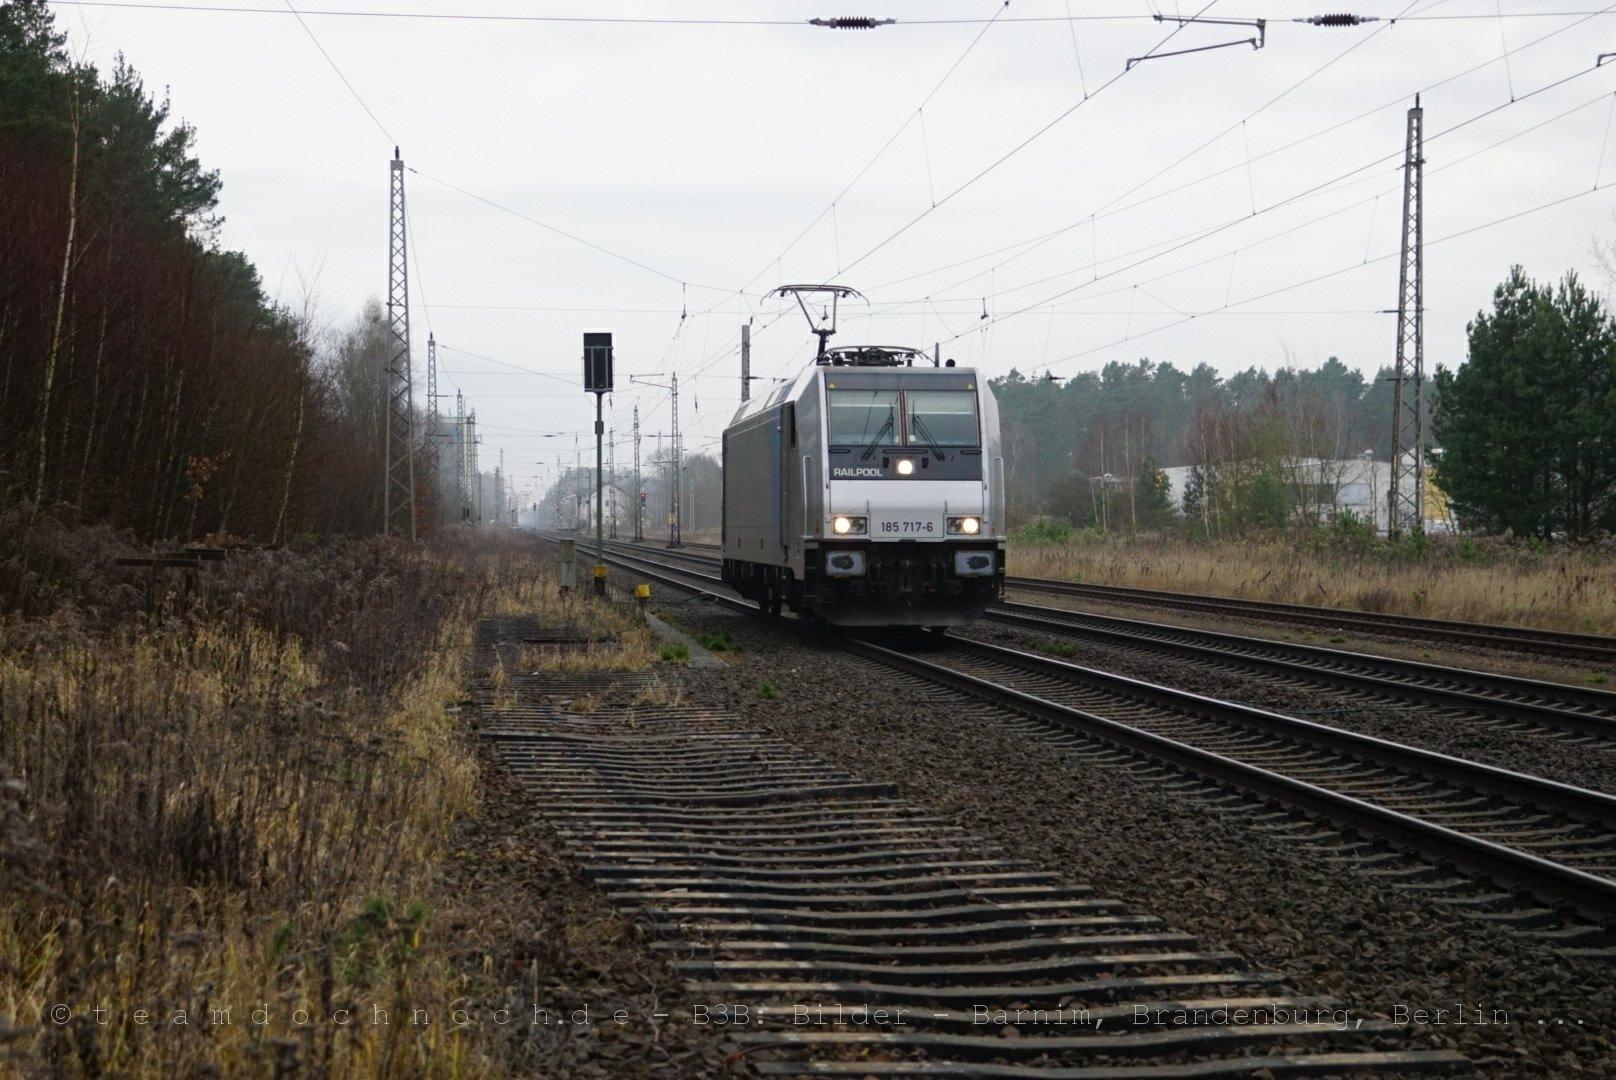 Railpool 185 717-6 durchfährt den Bahnhof Biesenthal